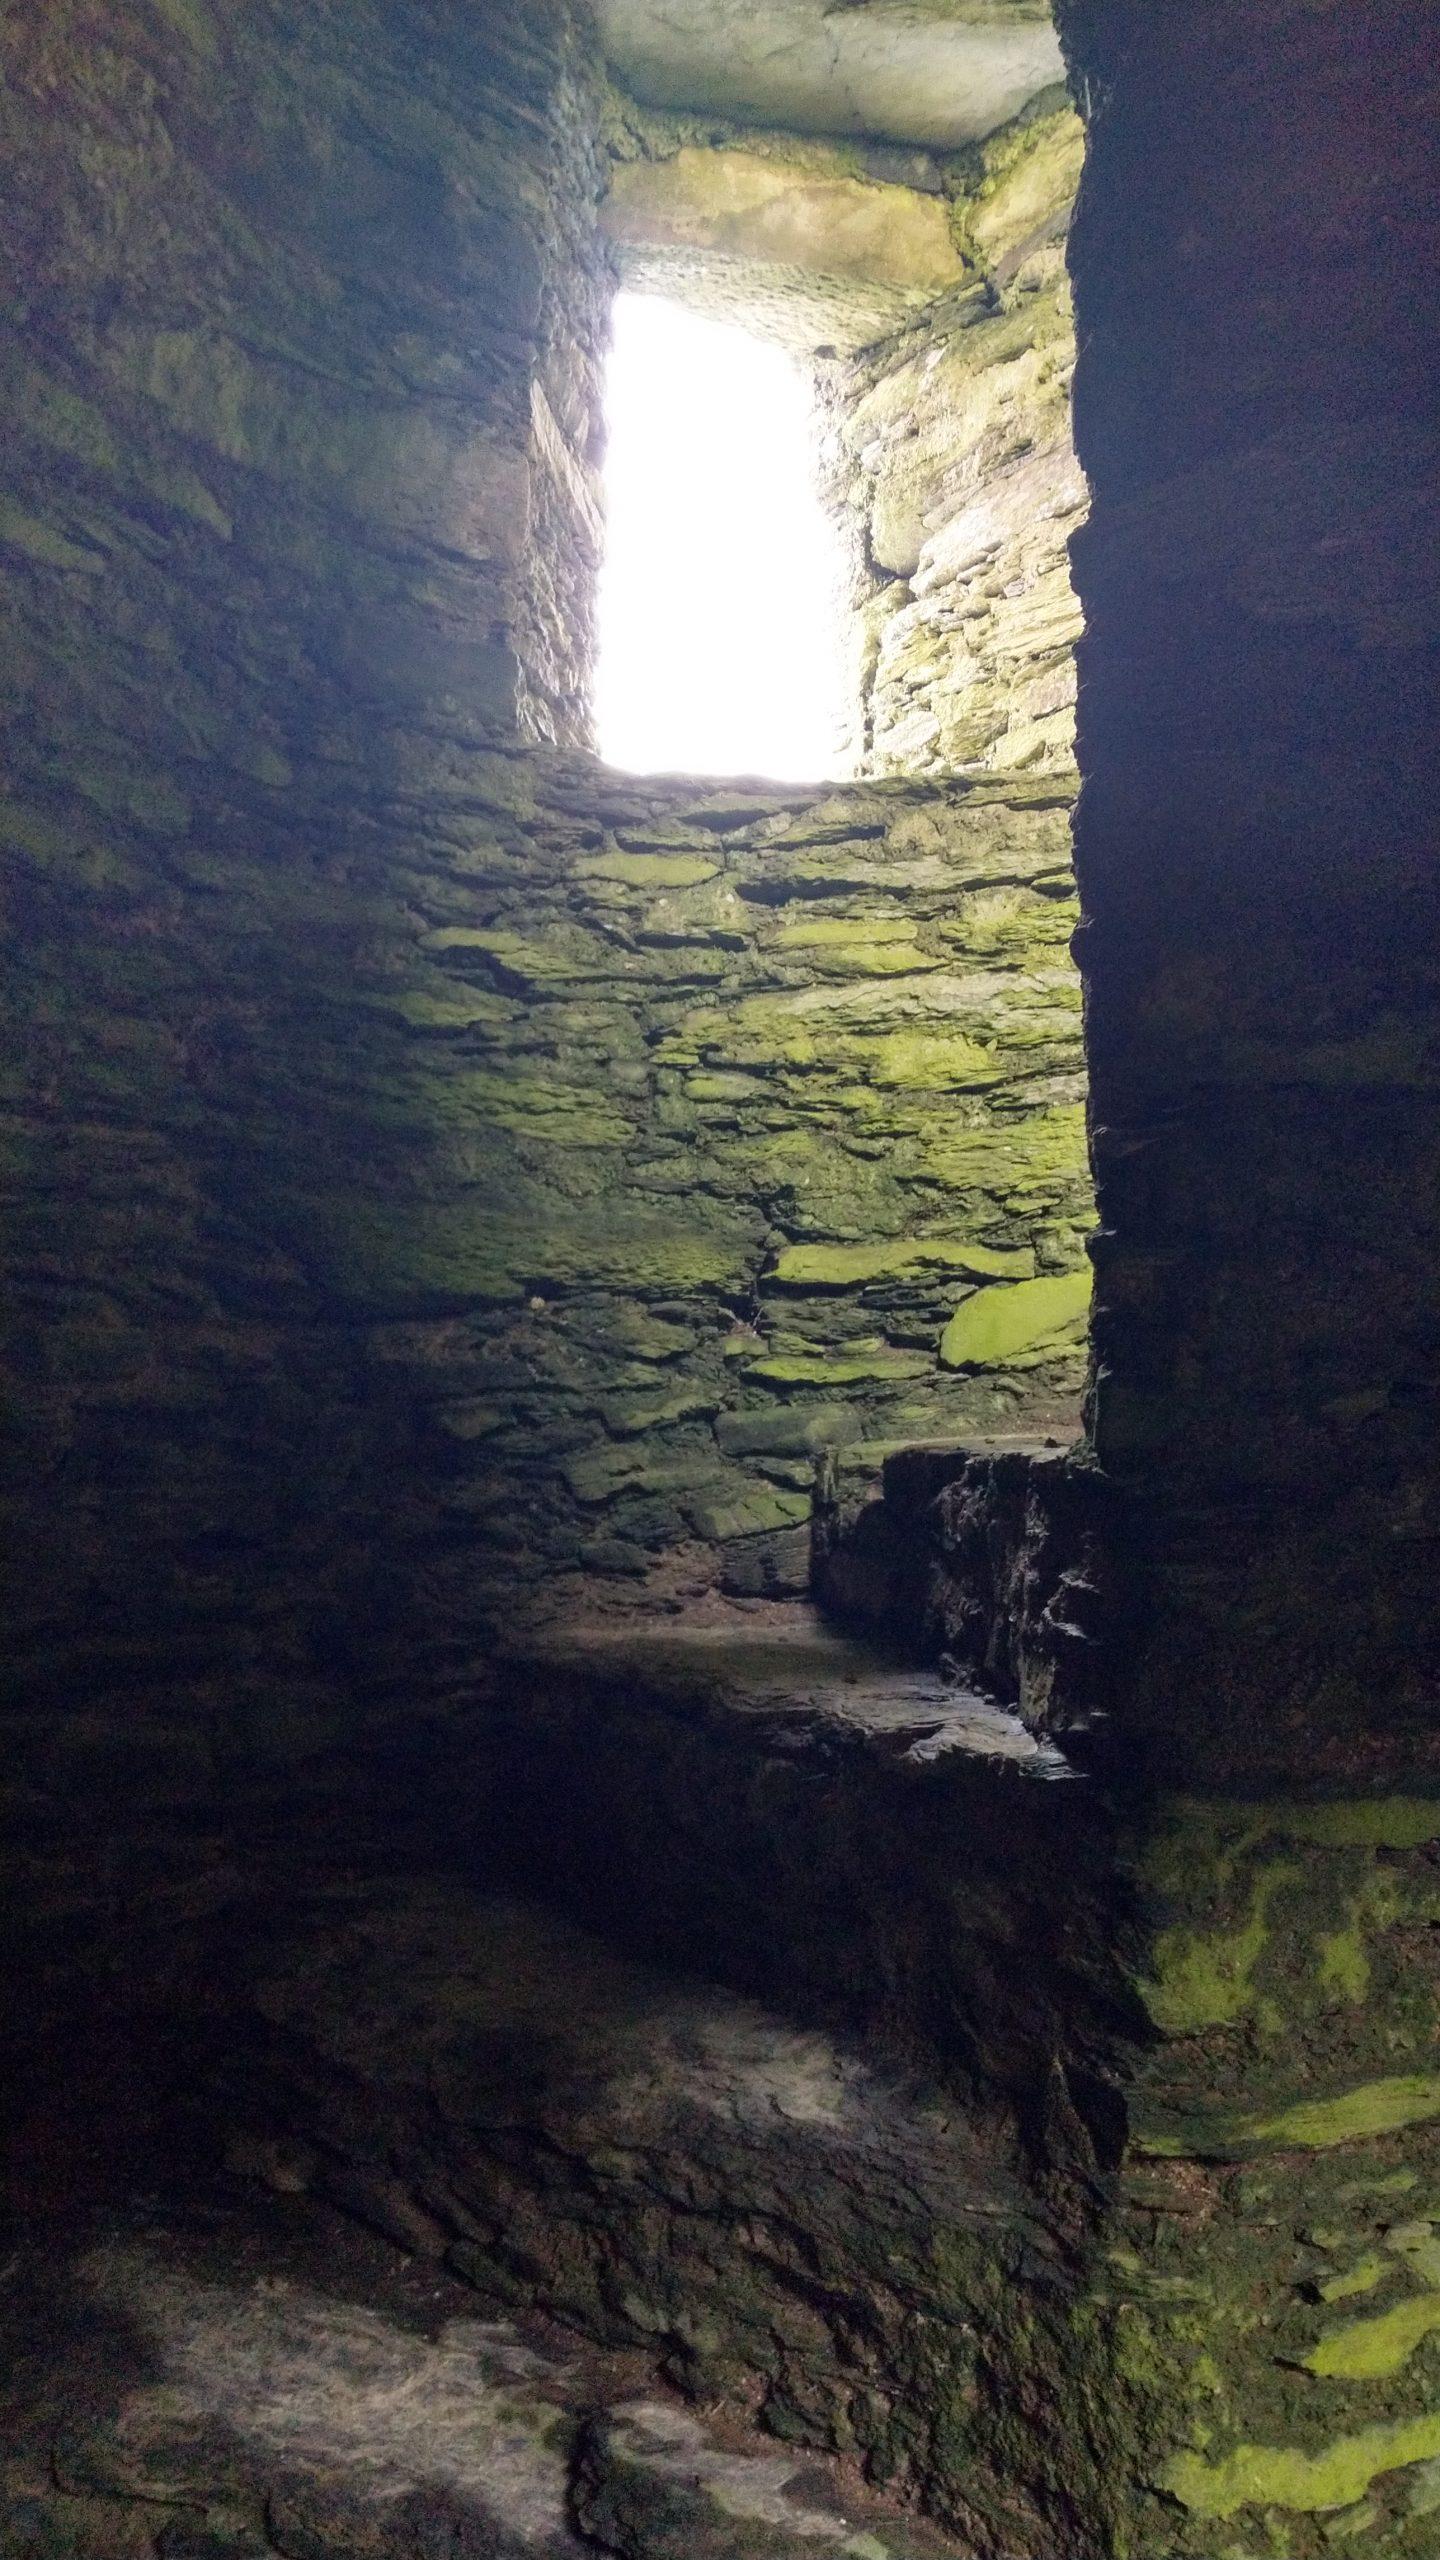 Castle Donovan Irland, Treppenaufgang